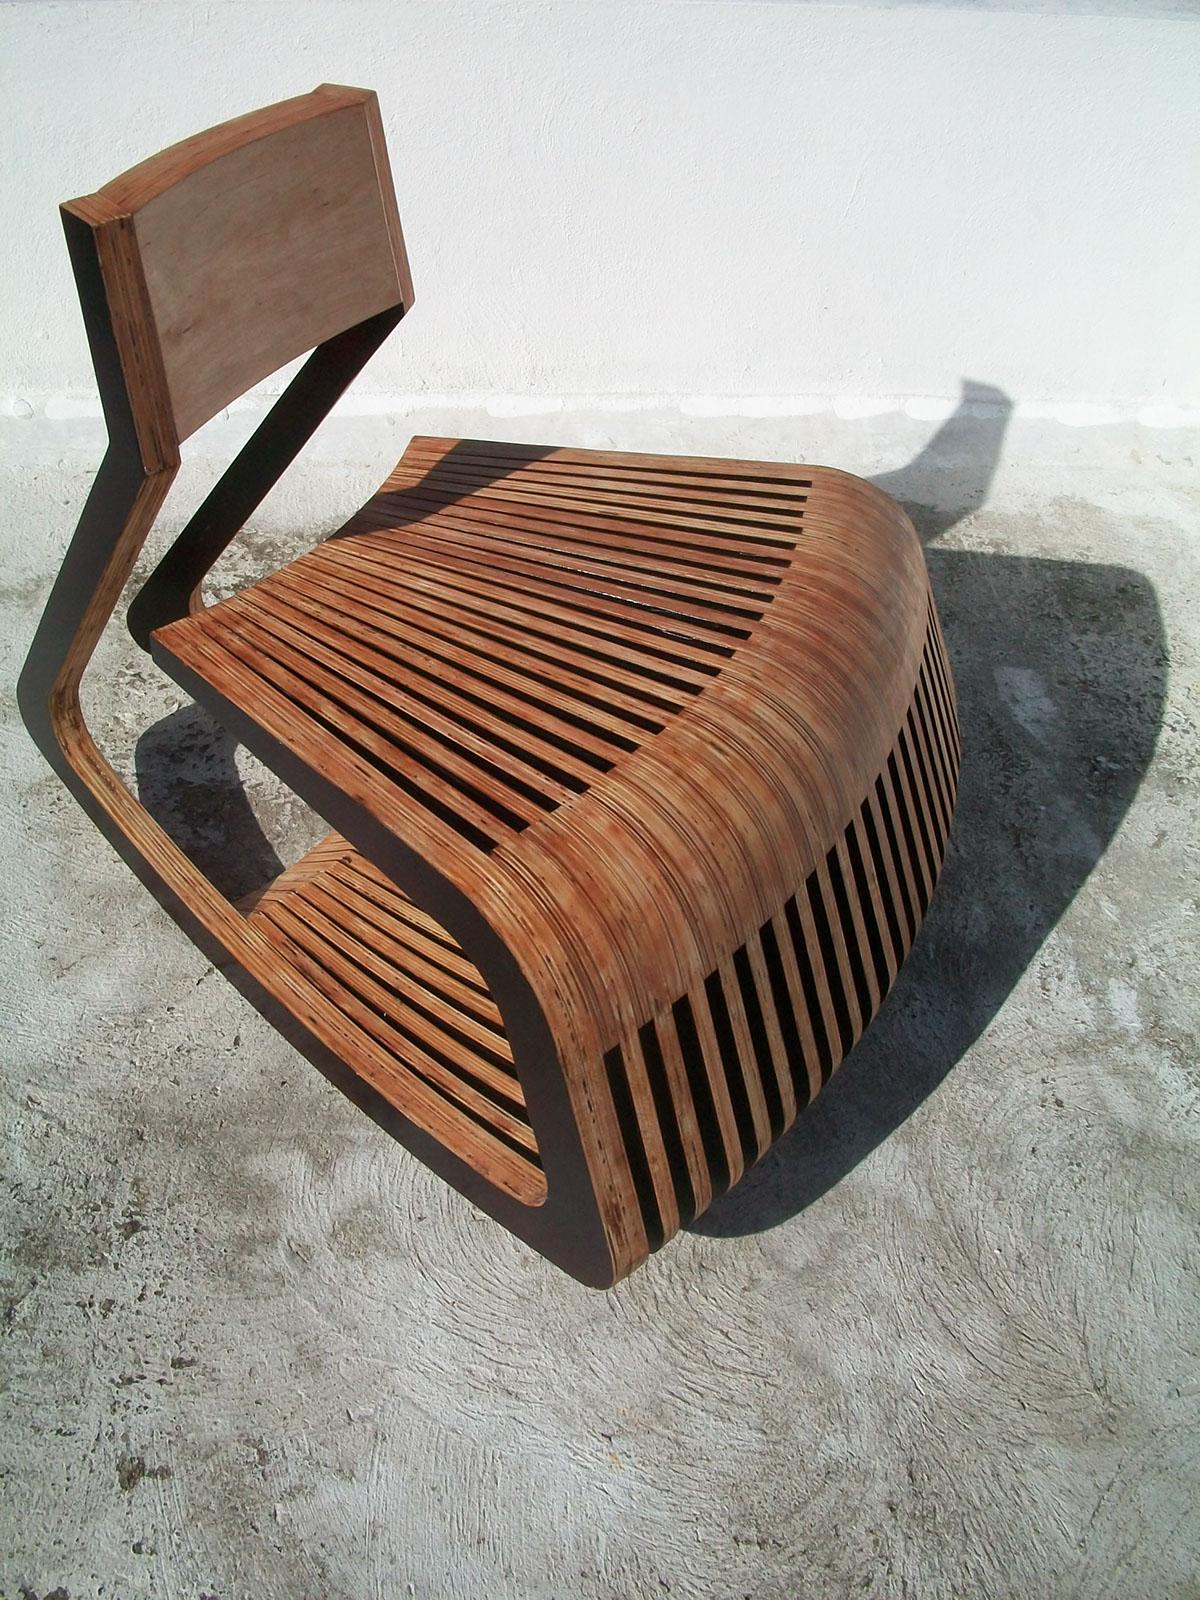 Rocker Caribbean mecedora ROCKER CHAIR wood plywood